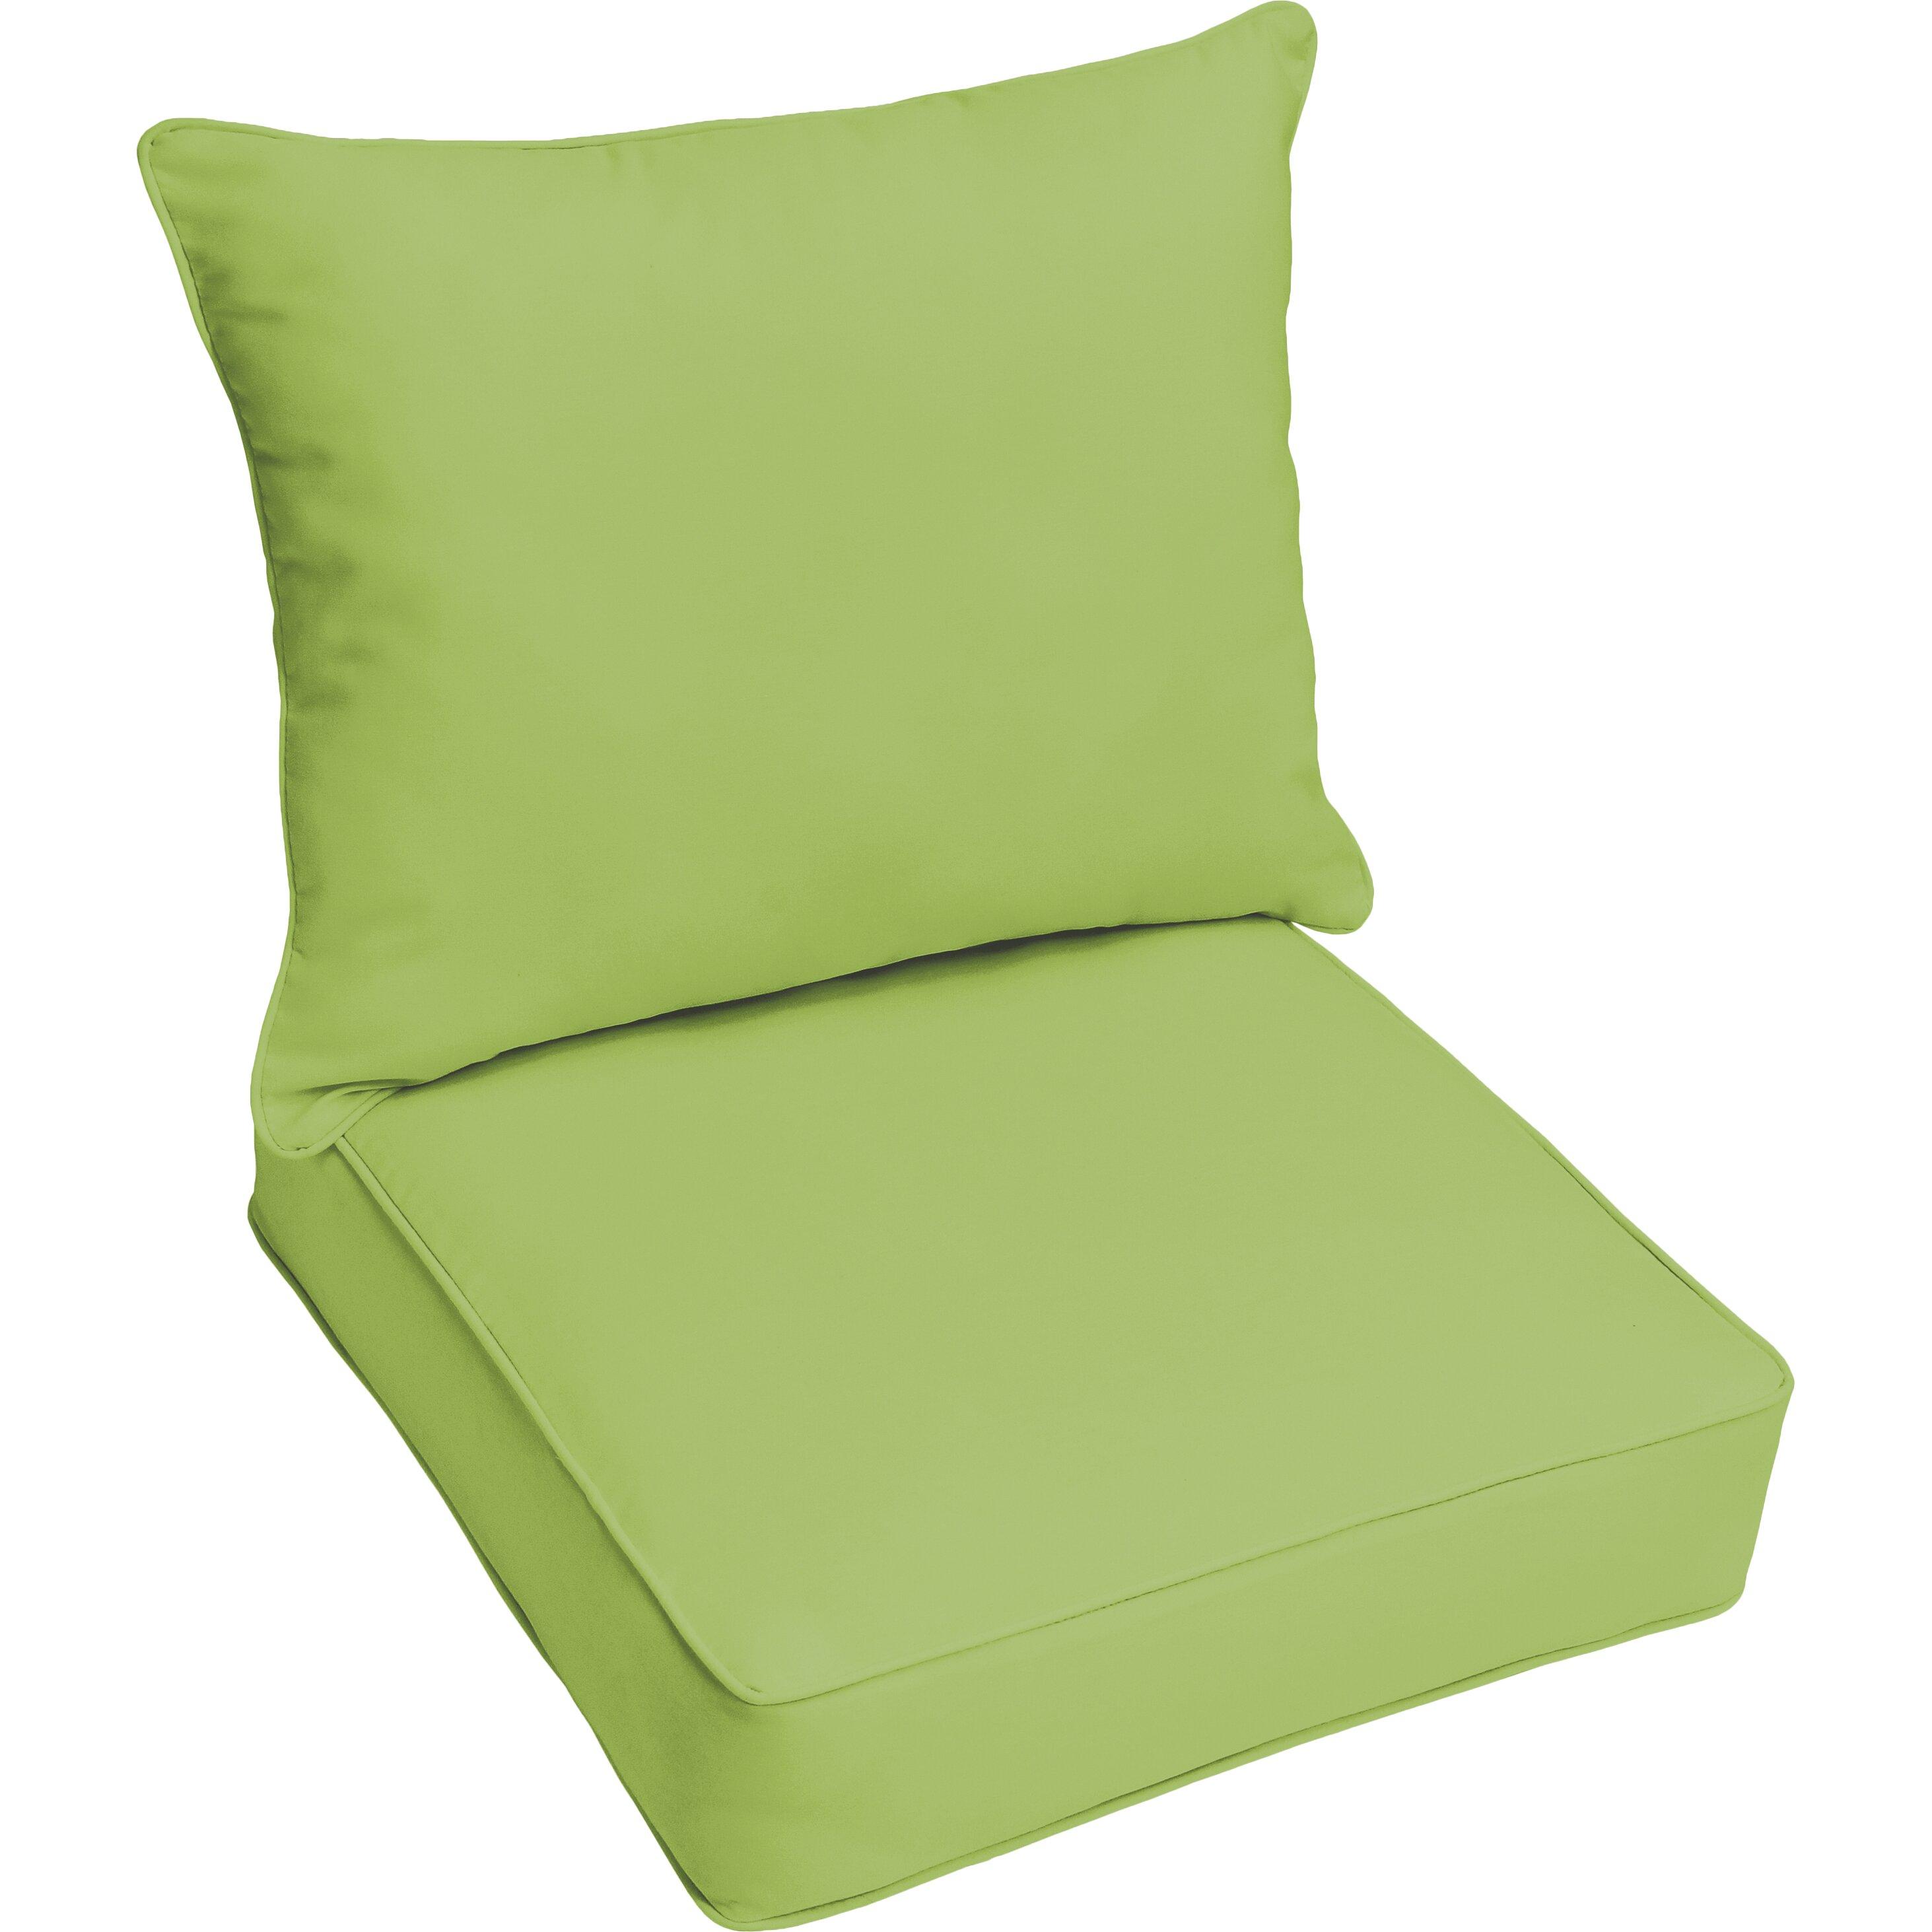 Brayden Studio Kaplan Outdoor Lounge Cushion Reviews